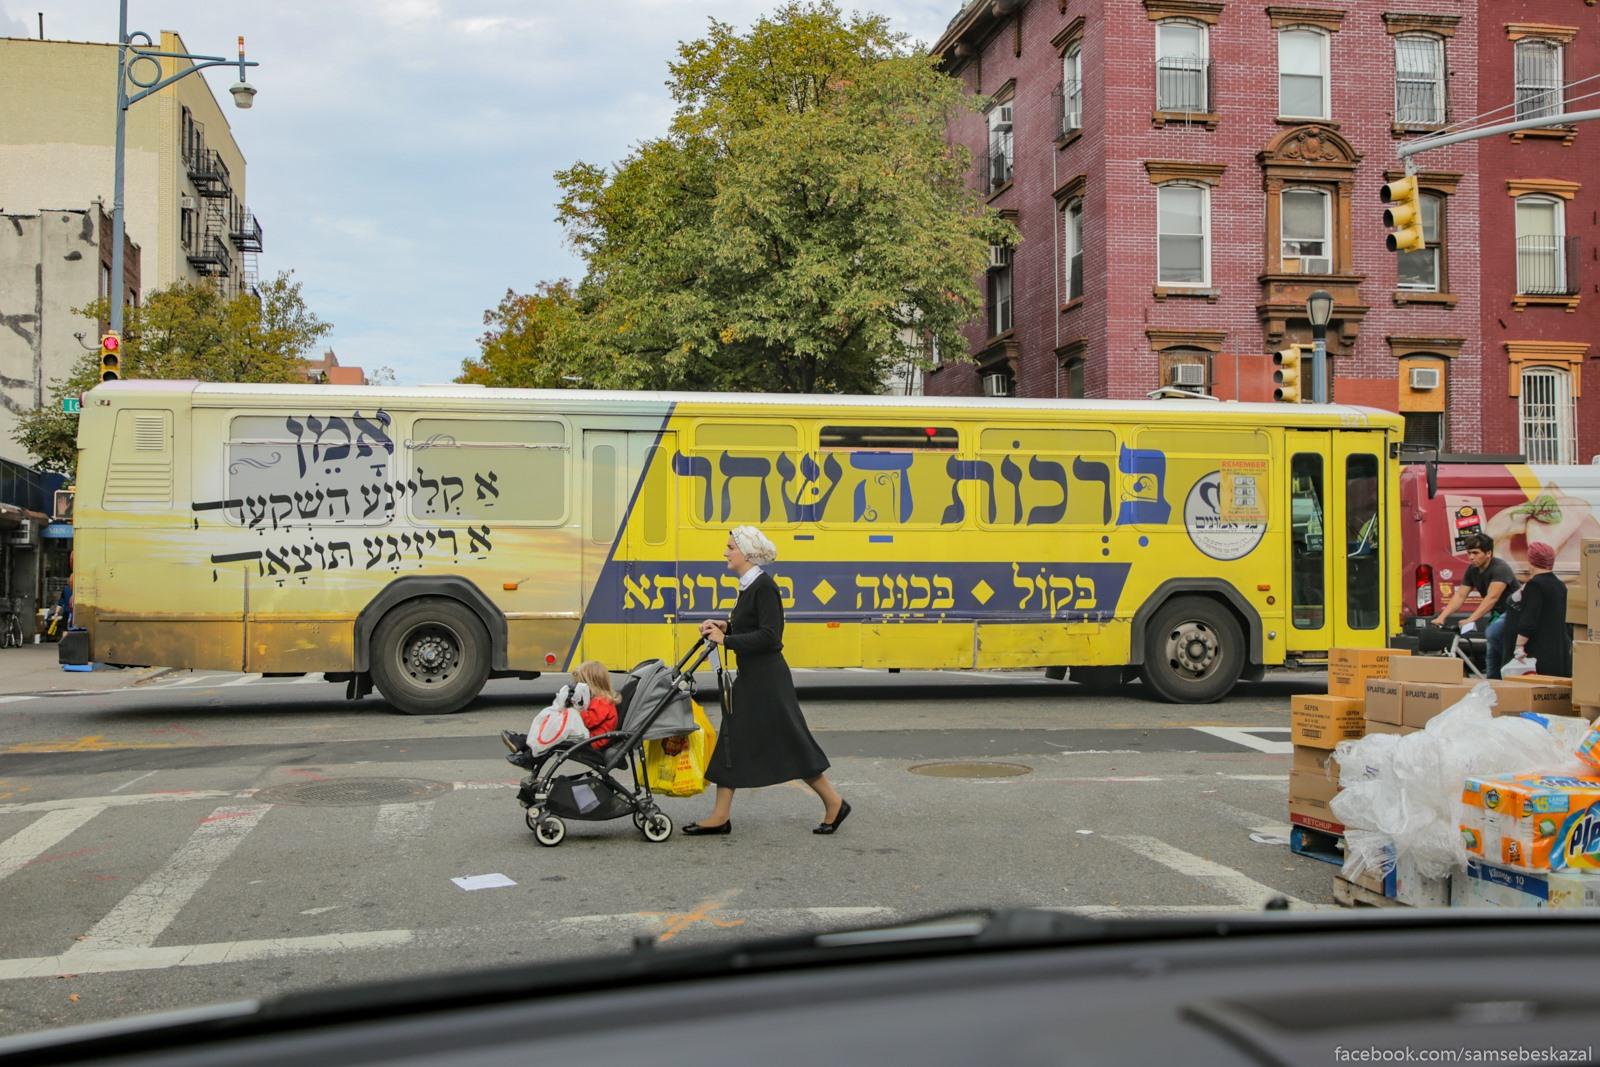 110-j avtobus soedinausij dva hasidskih rajona: Uilʹamsburg i Boro-park. Zensiny vnutri edut na zadnej plosadke, a muzciny na perednej.